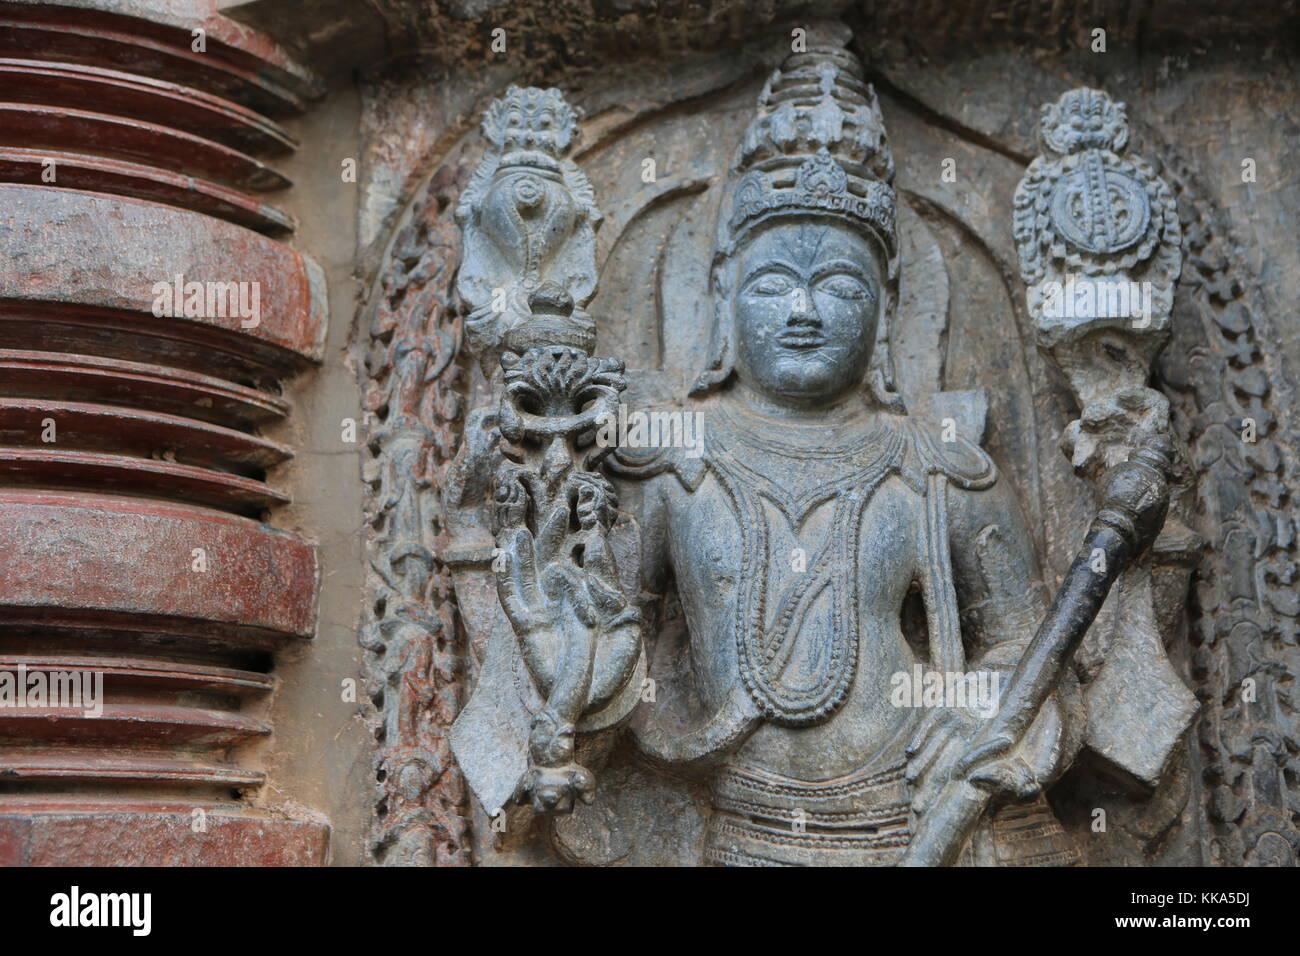 Chenna Keshava Vishnu Tempel - Belour south india Stock Photo